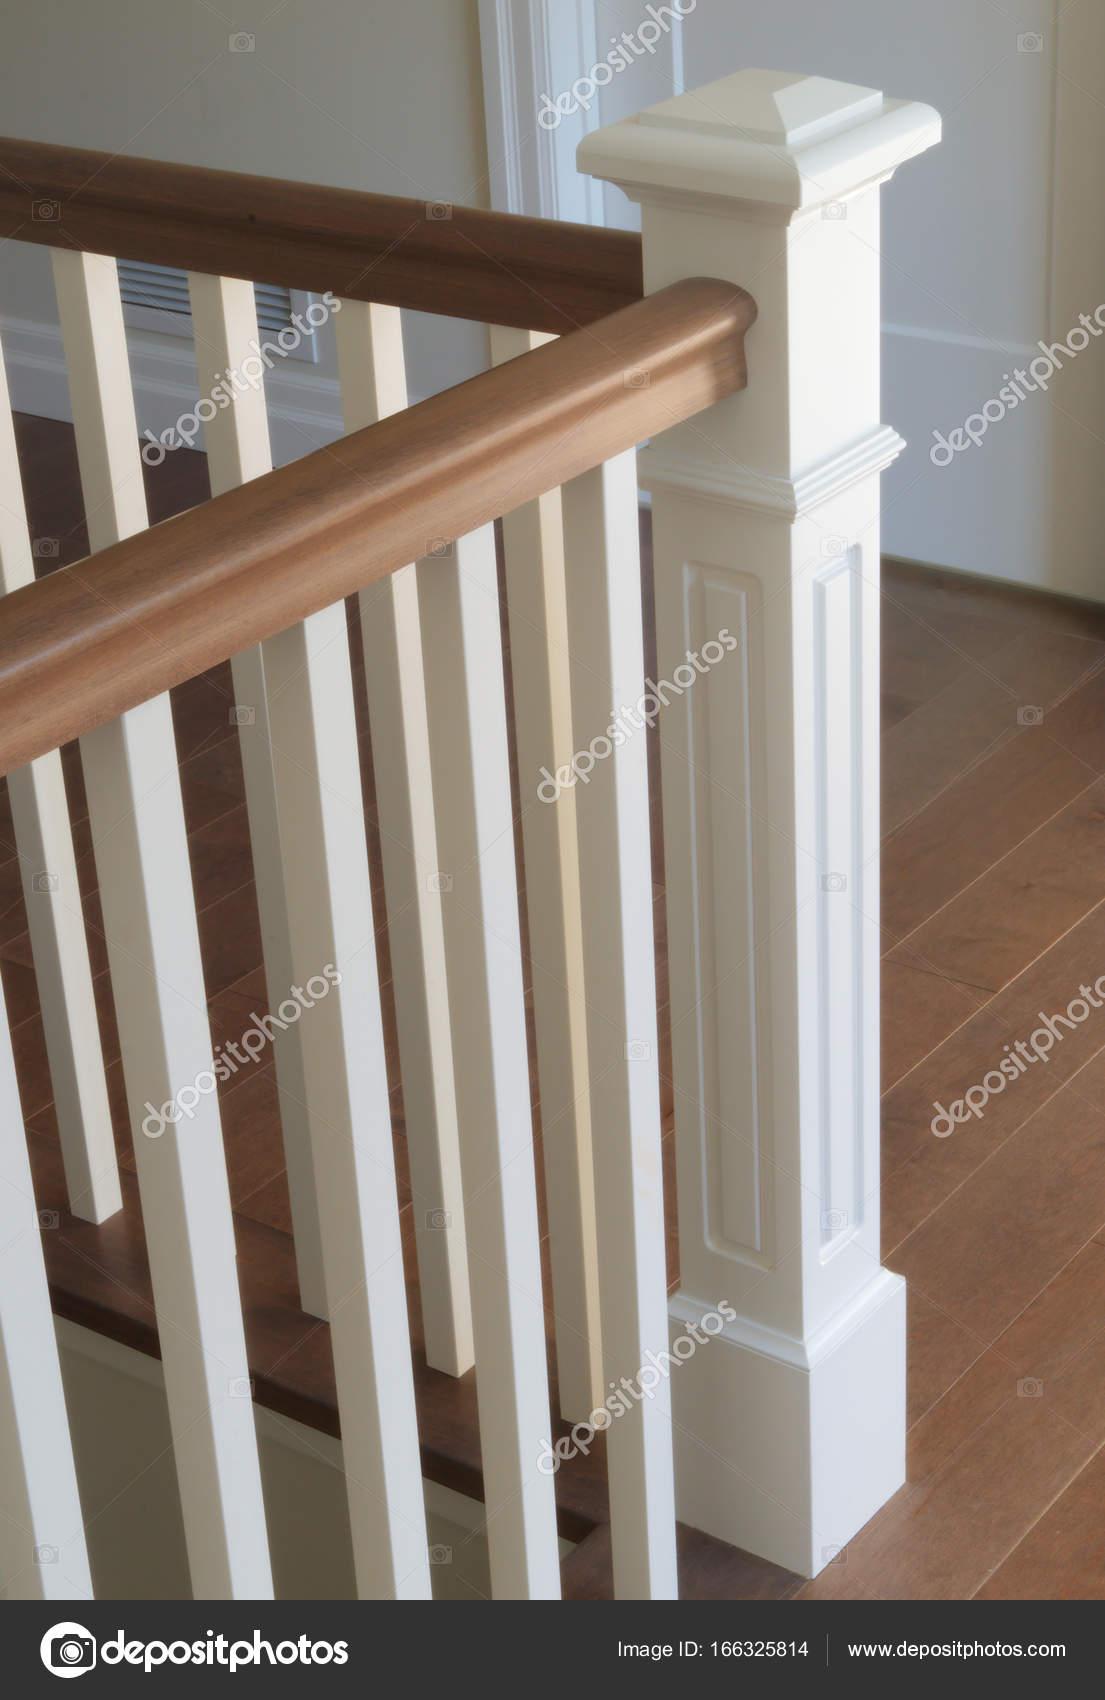 Klassische Treppen treppe holz weiße moderne klassische treppen innen stockfoto